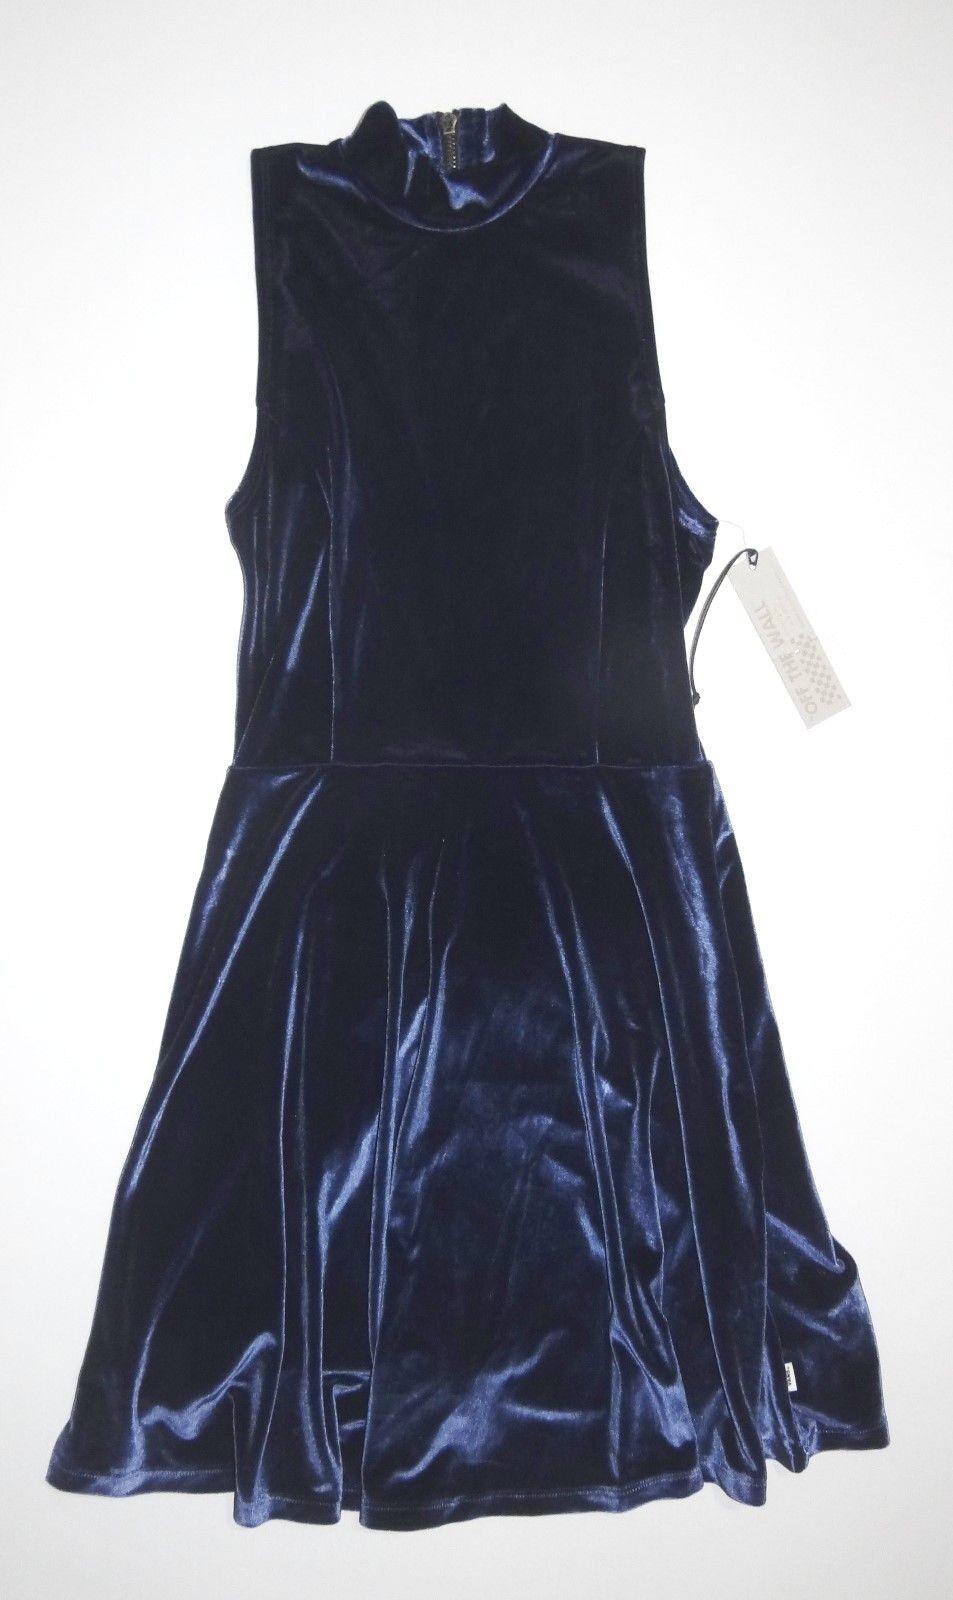 New Vans Womens Vixon Velour Sleeveless Casual Dress